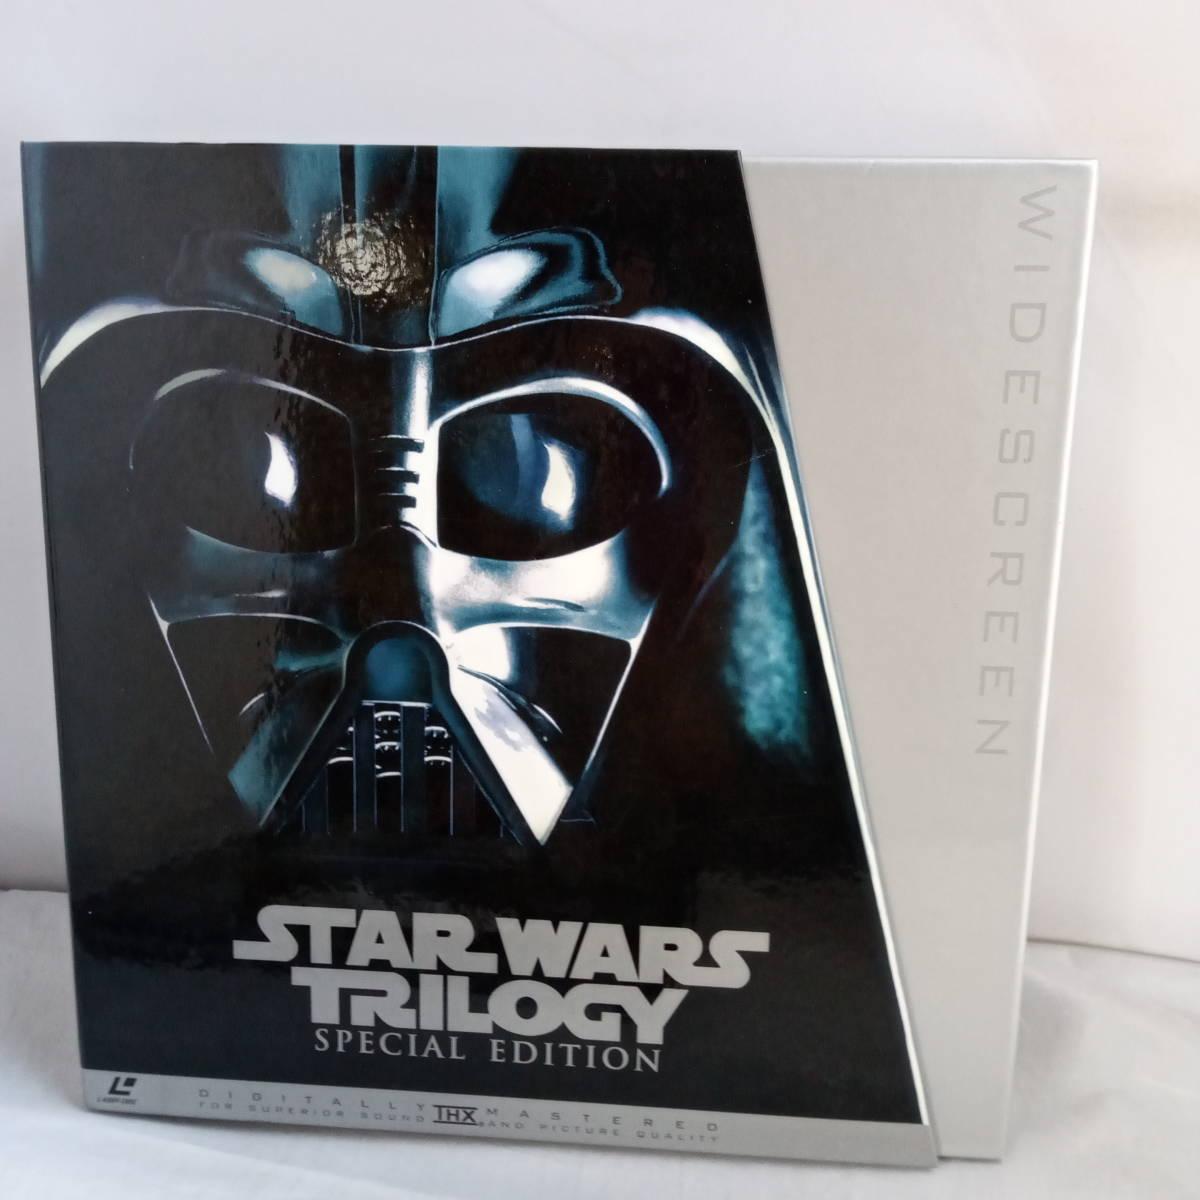 L2721 LD・レーザーディスク STAR WARS TRILOGY SPECIAL EDITION レーザーディスク スターウォーズ トリロジー_画像1